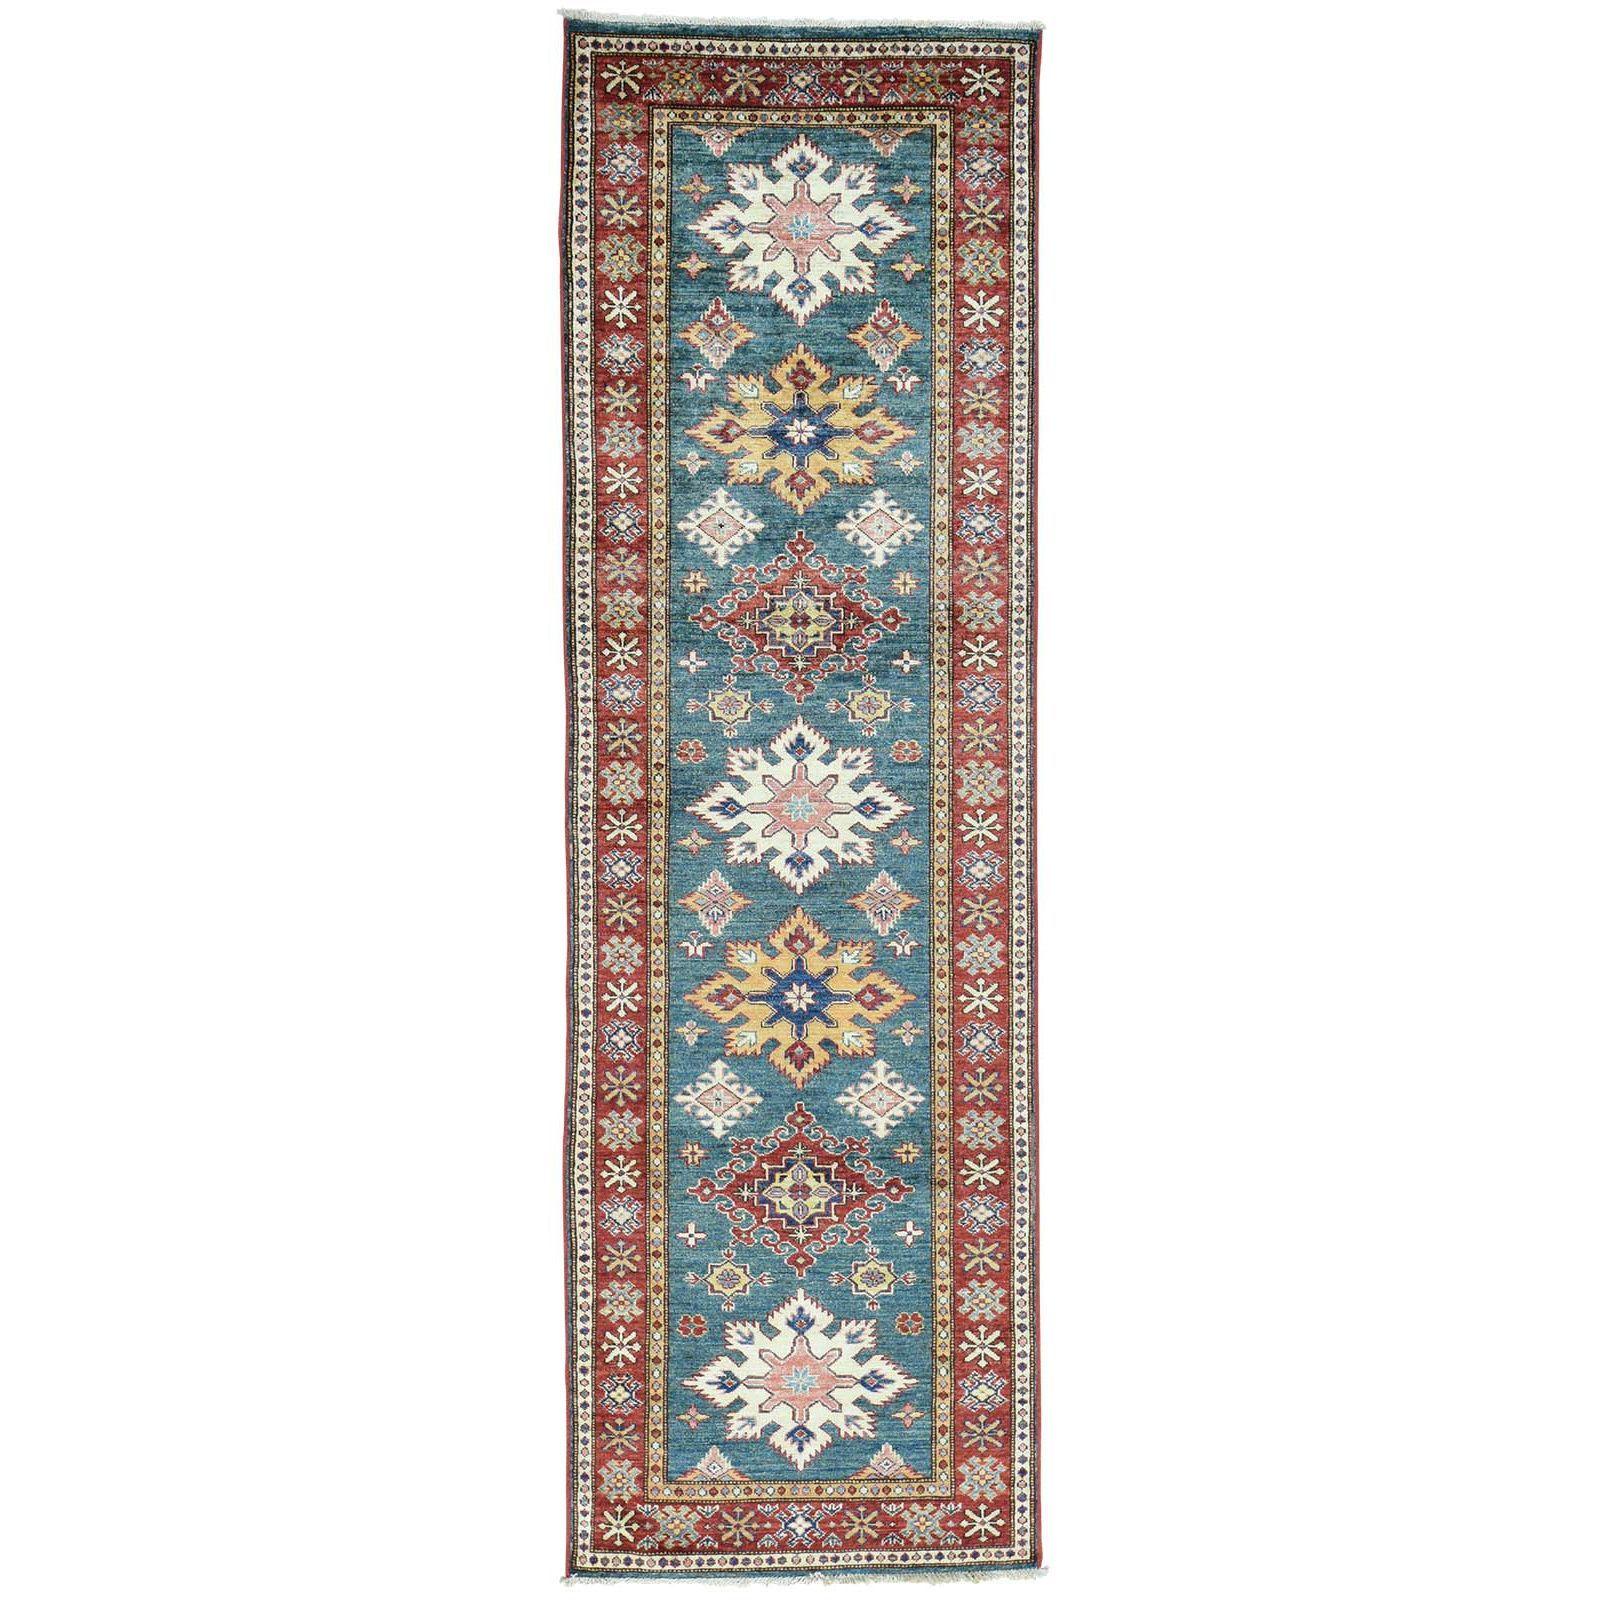 "1800getarug Hand-Knotted Super Kazak Tribal Design Runner Oriental Rug (2'7x8'5) (Exact Size: 2'7"" x 8'5""), Green, Size 3' x 8'"